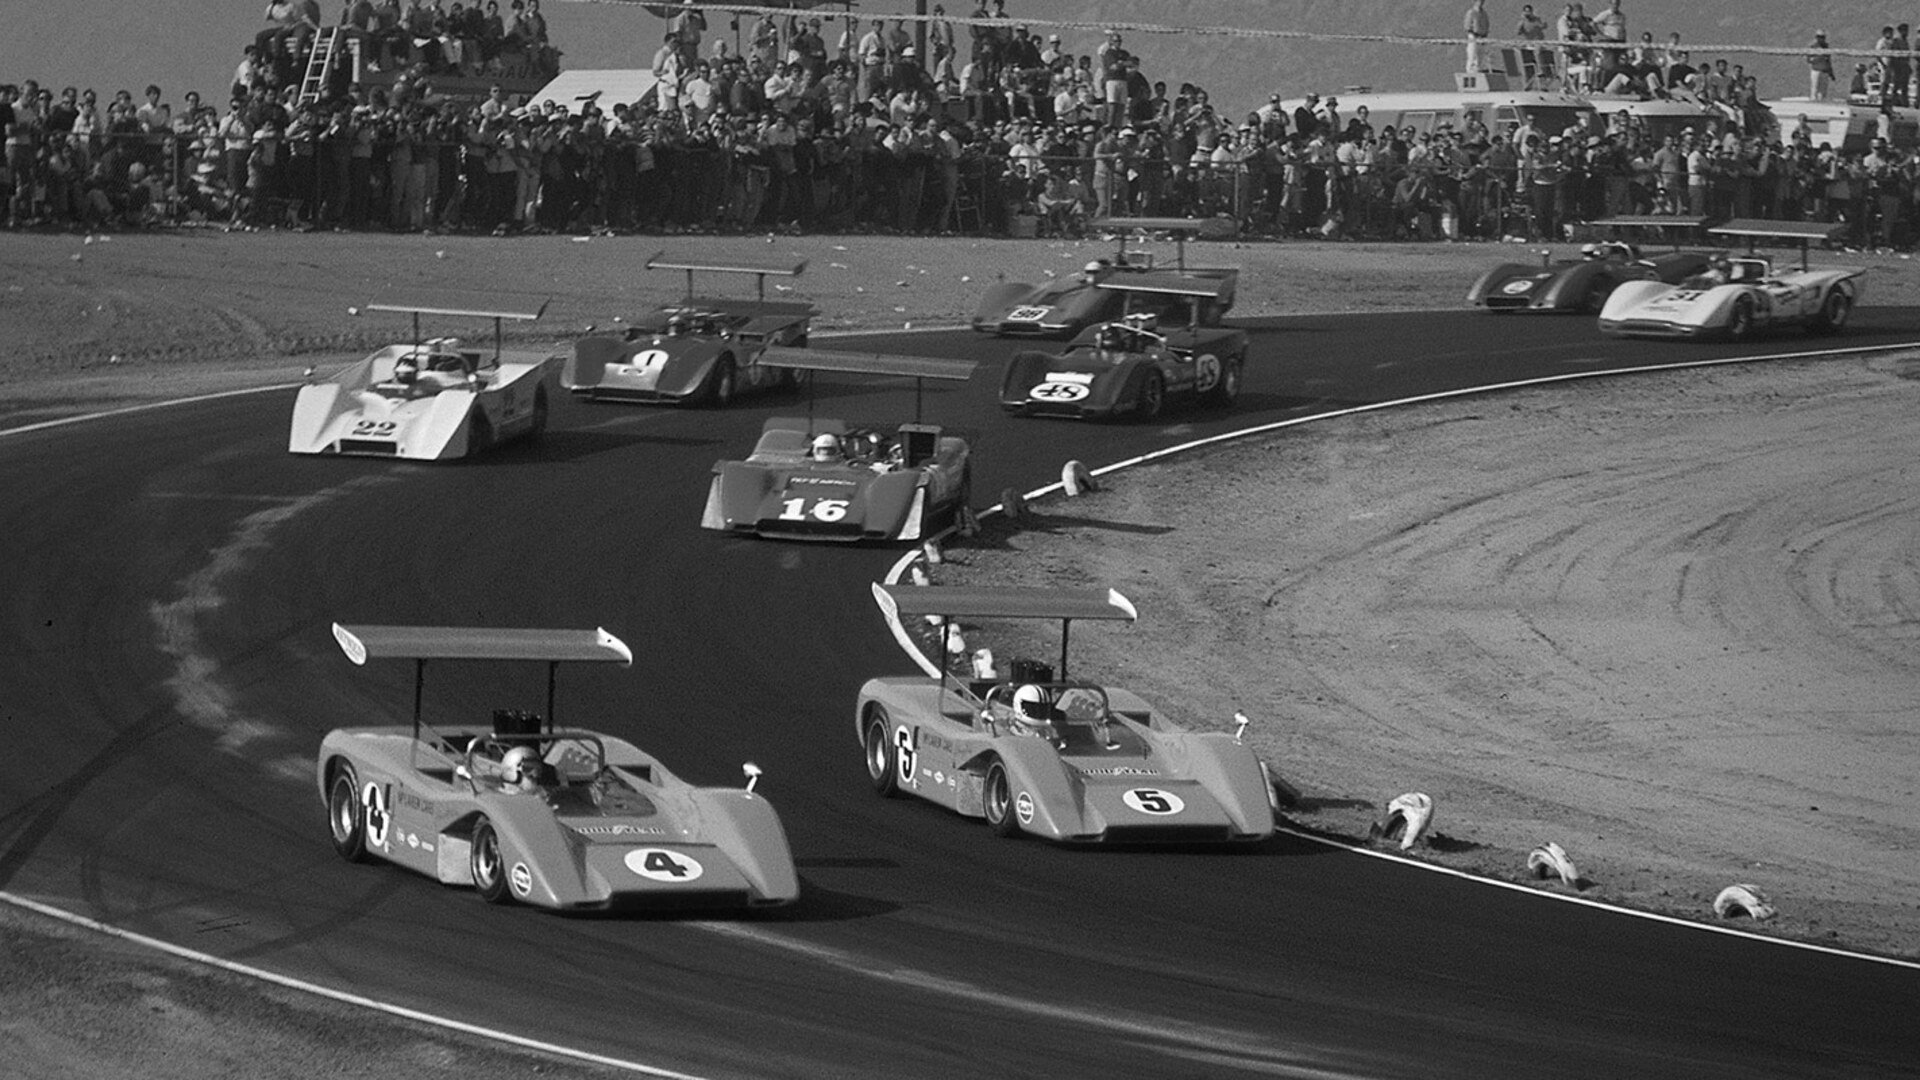 McLaren racing - 1965s - the Bruce and Denny show - photo via McLaren Automotive